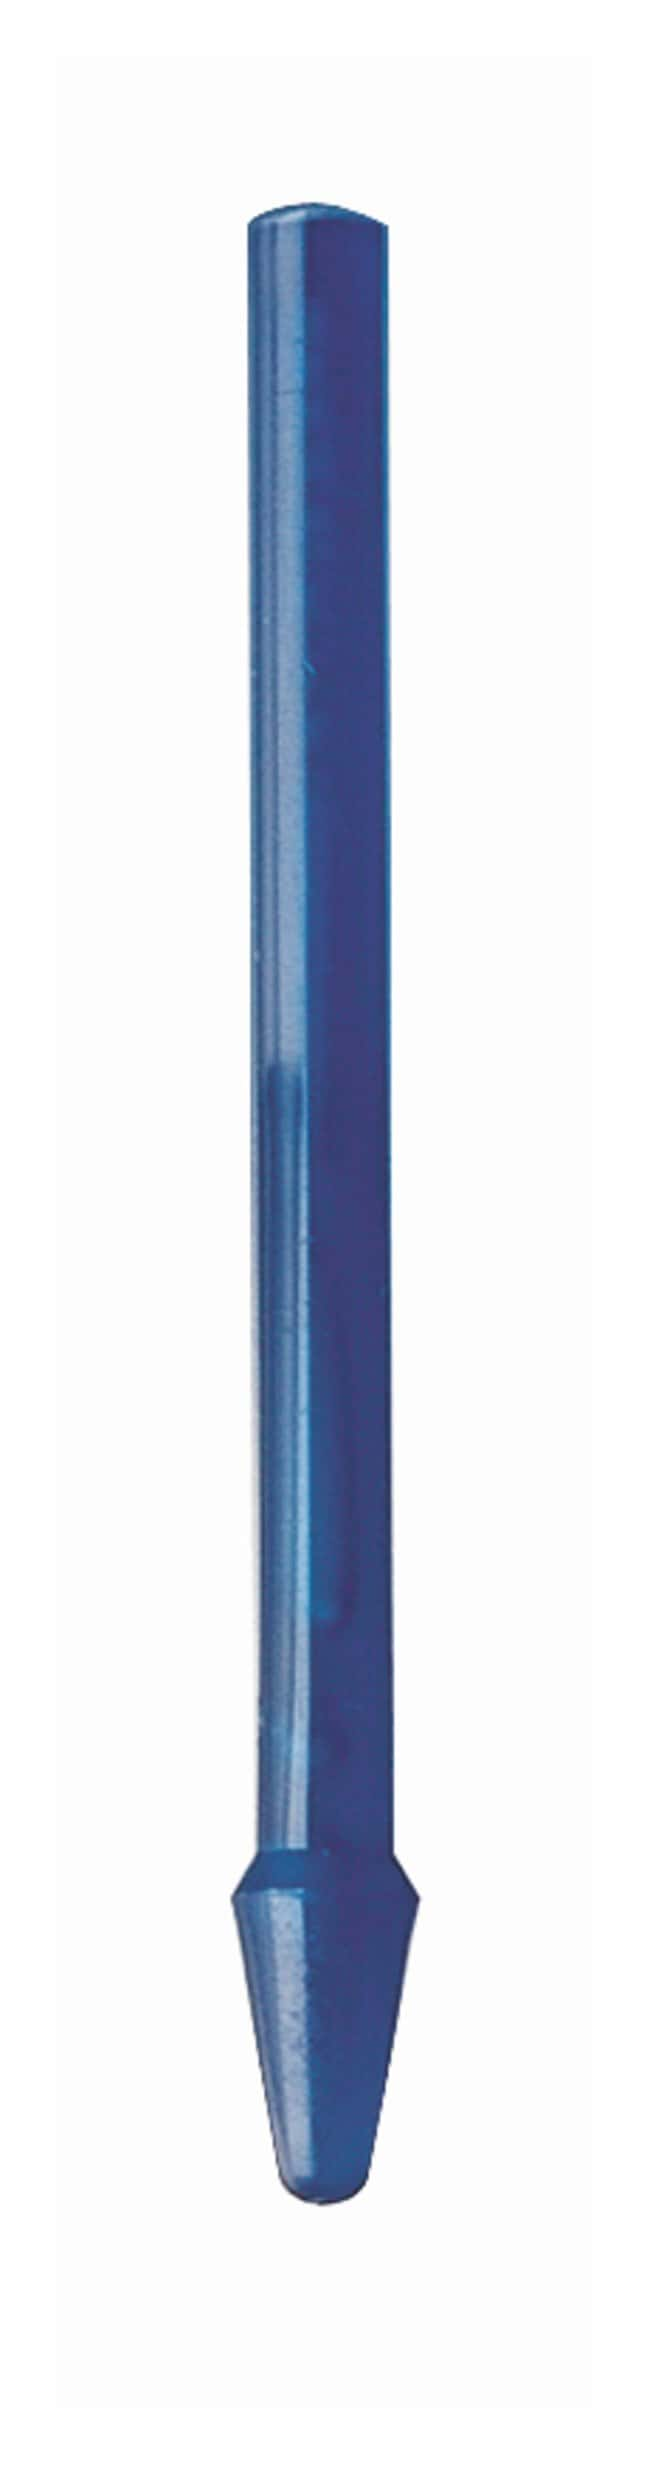 FisherbrandRNase-Free Disposable Pellet Pestles Without tube:Histology